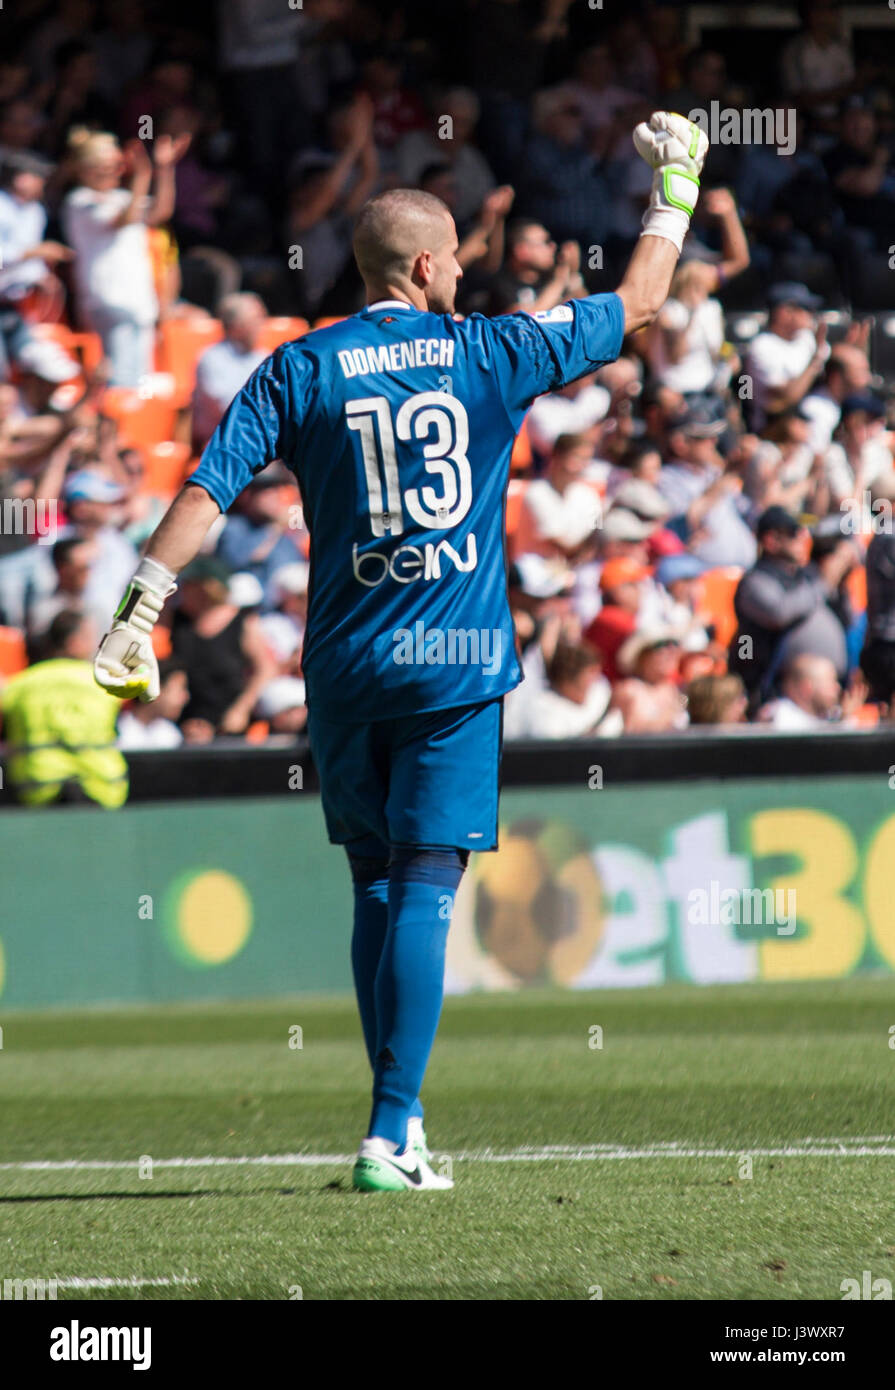 13 Jaume Domenech Of Valencia Cf During The Spanish La Liga Santander Stock Photo Alamy